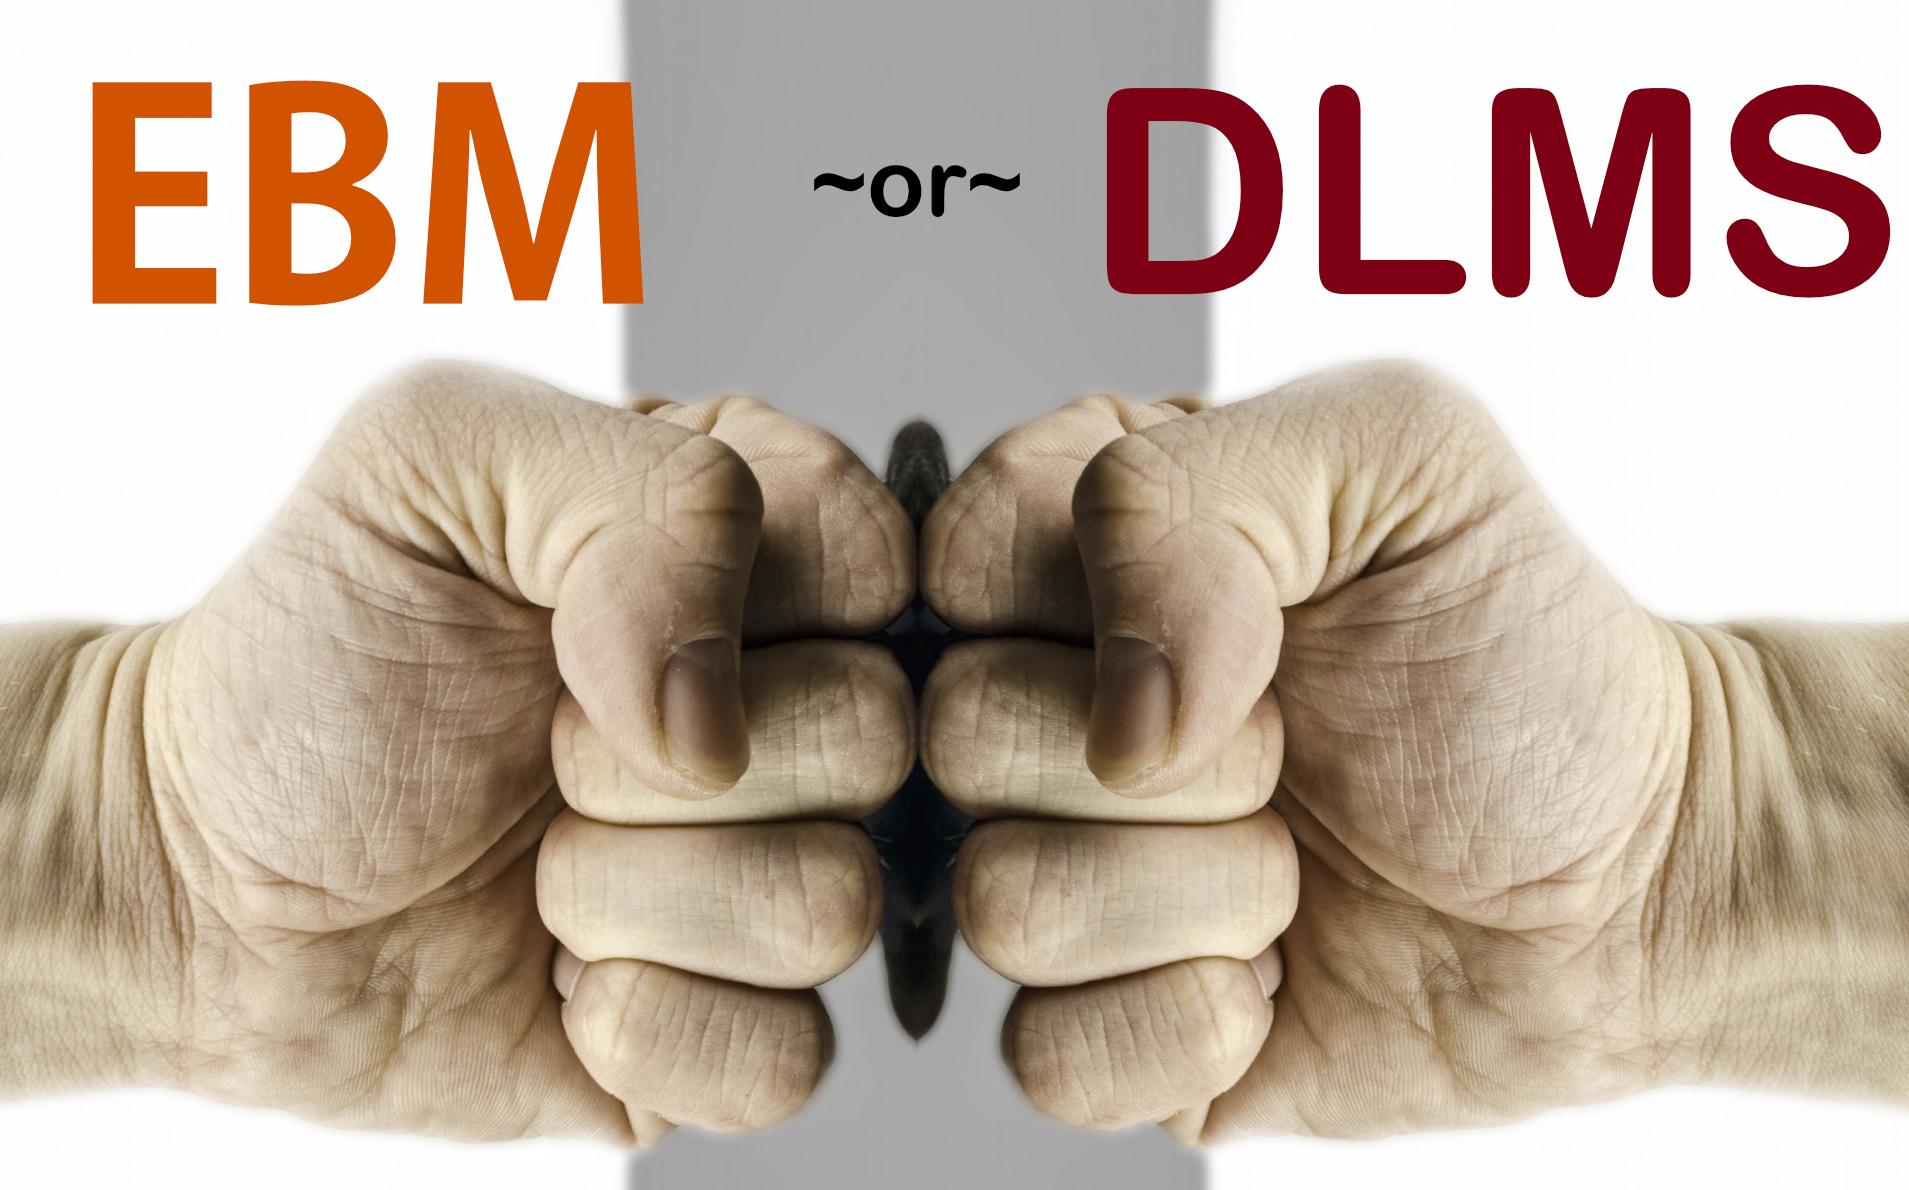 A Consideration of EBM versus DMLS Industrial Metal 3D Printing Processes, Part 2